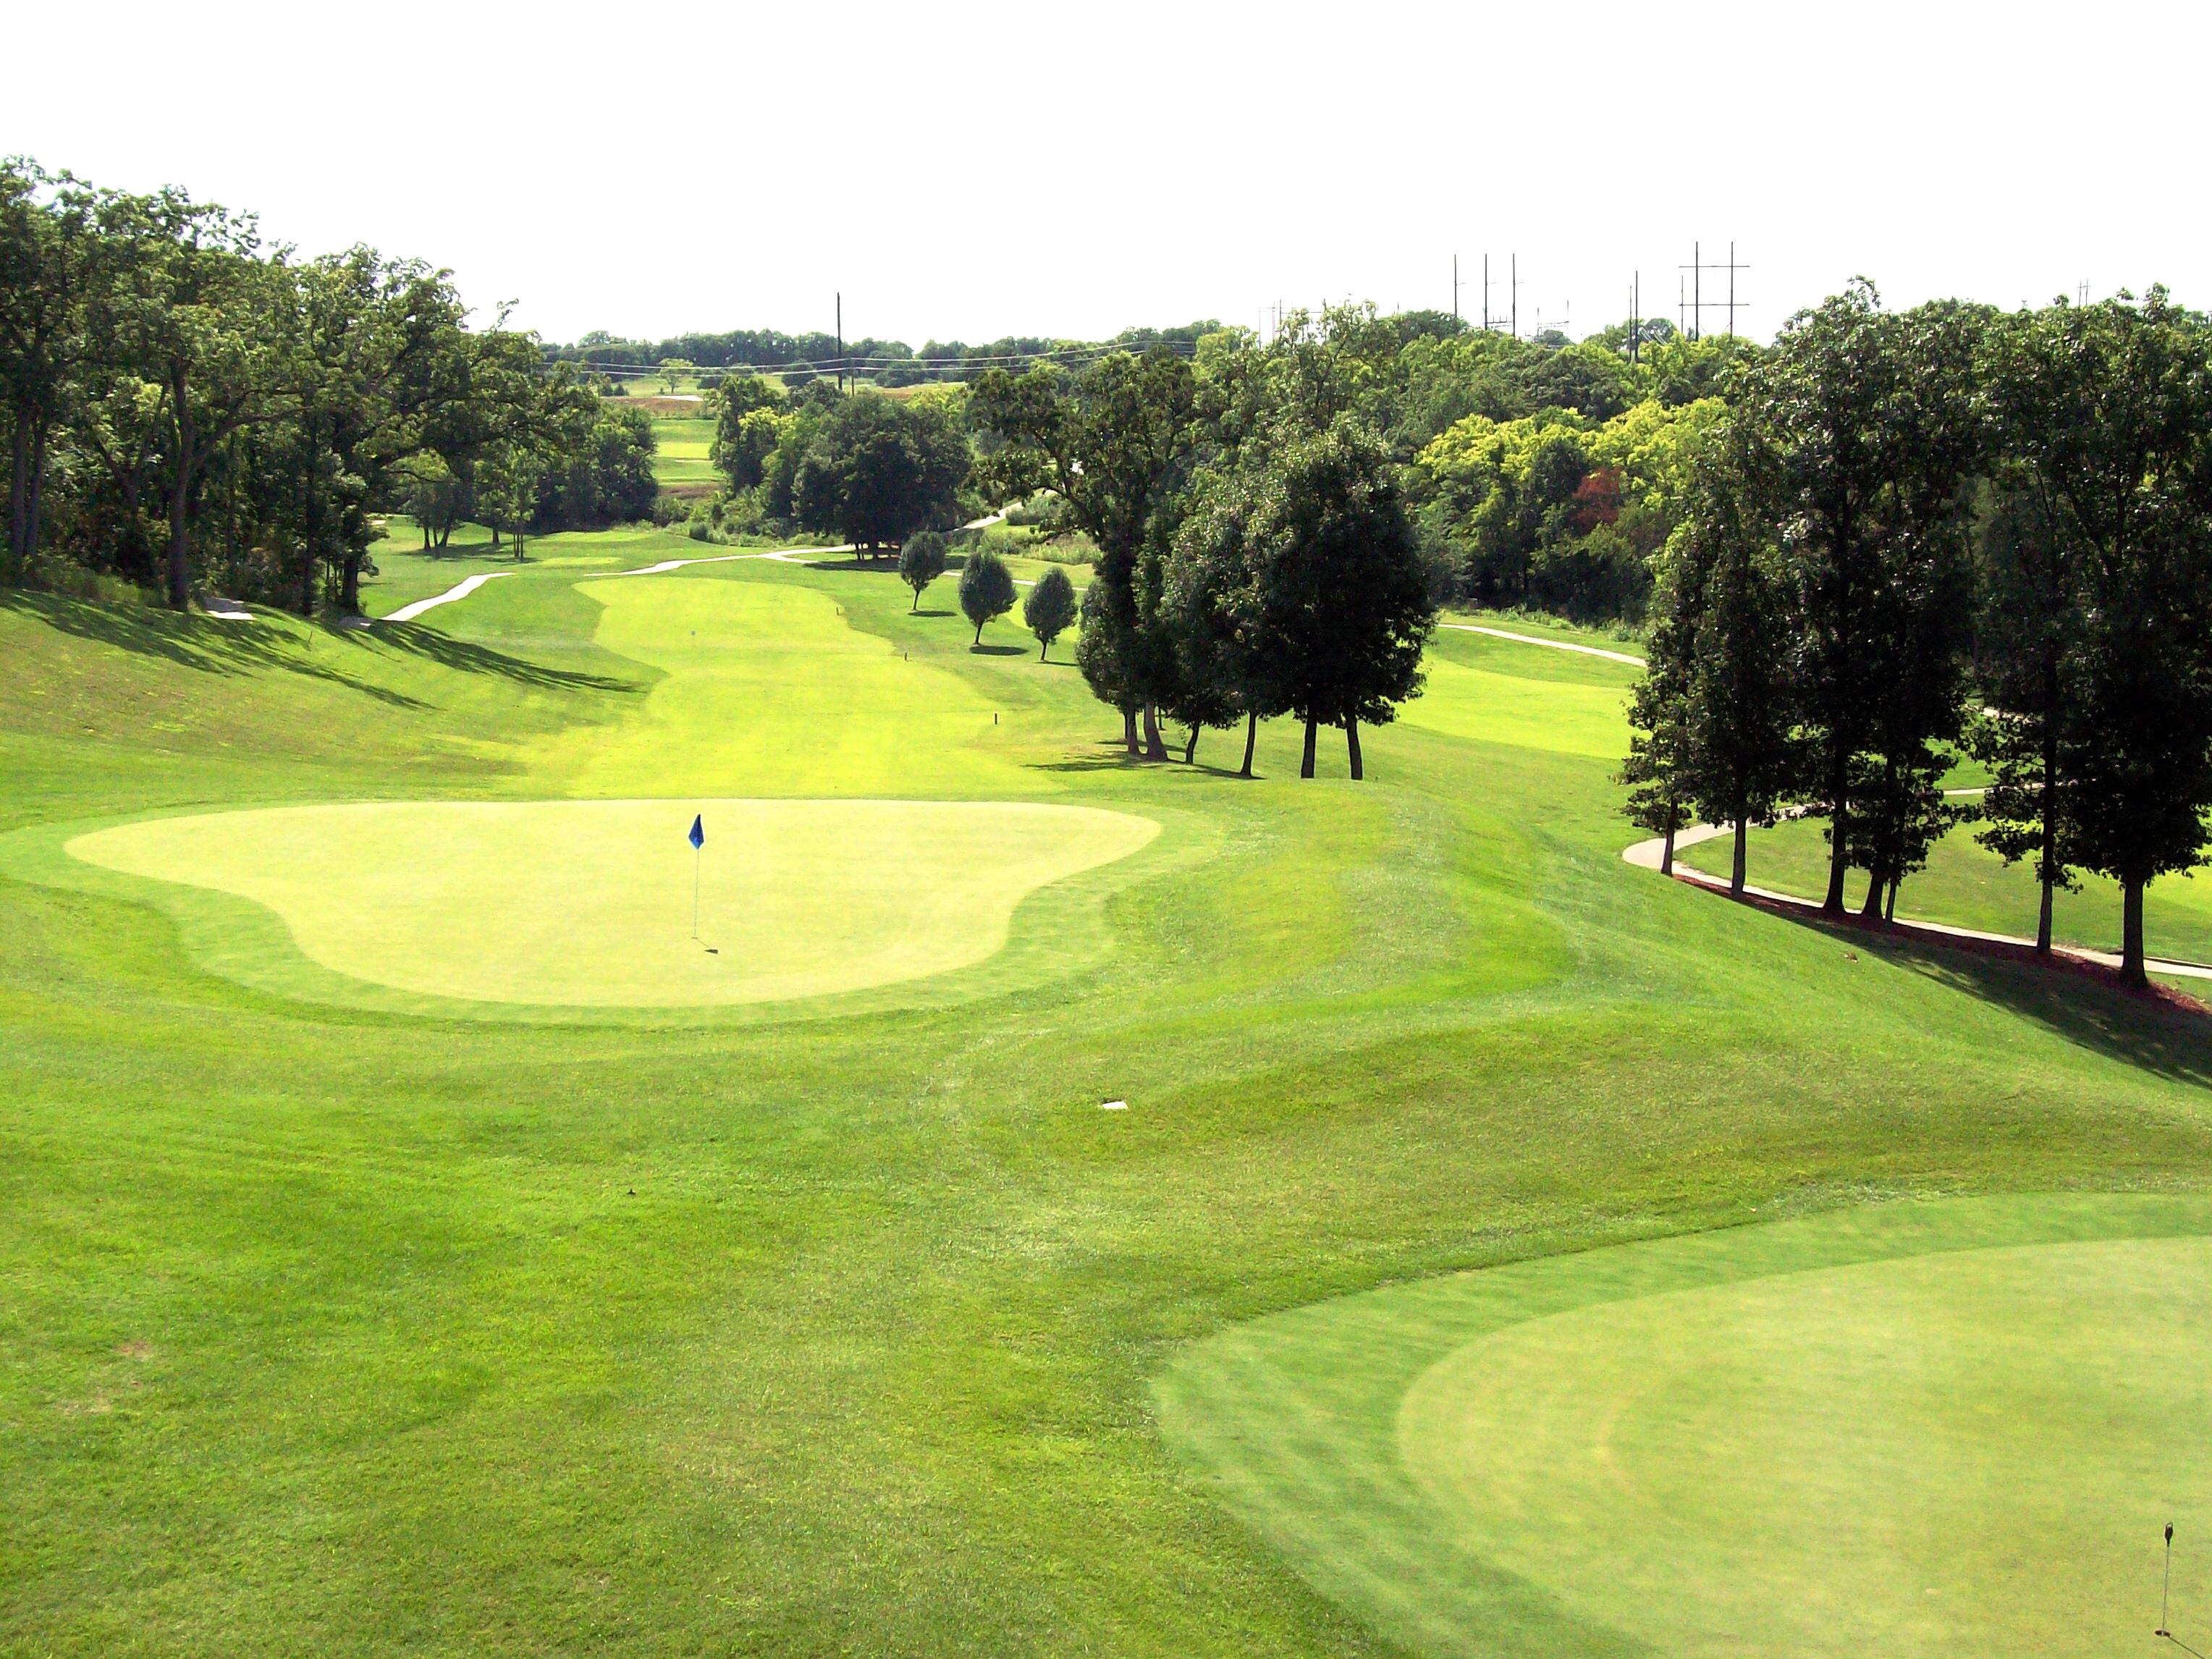 12-Golf Course.jpg